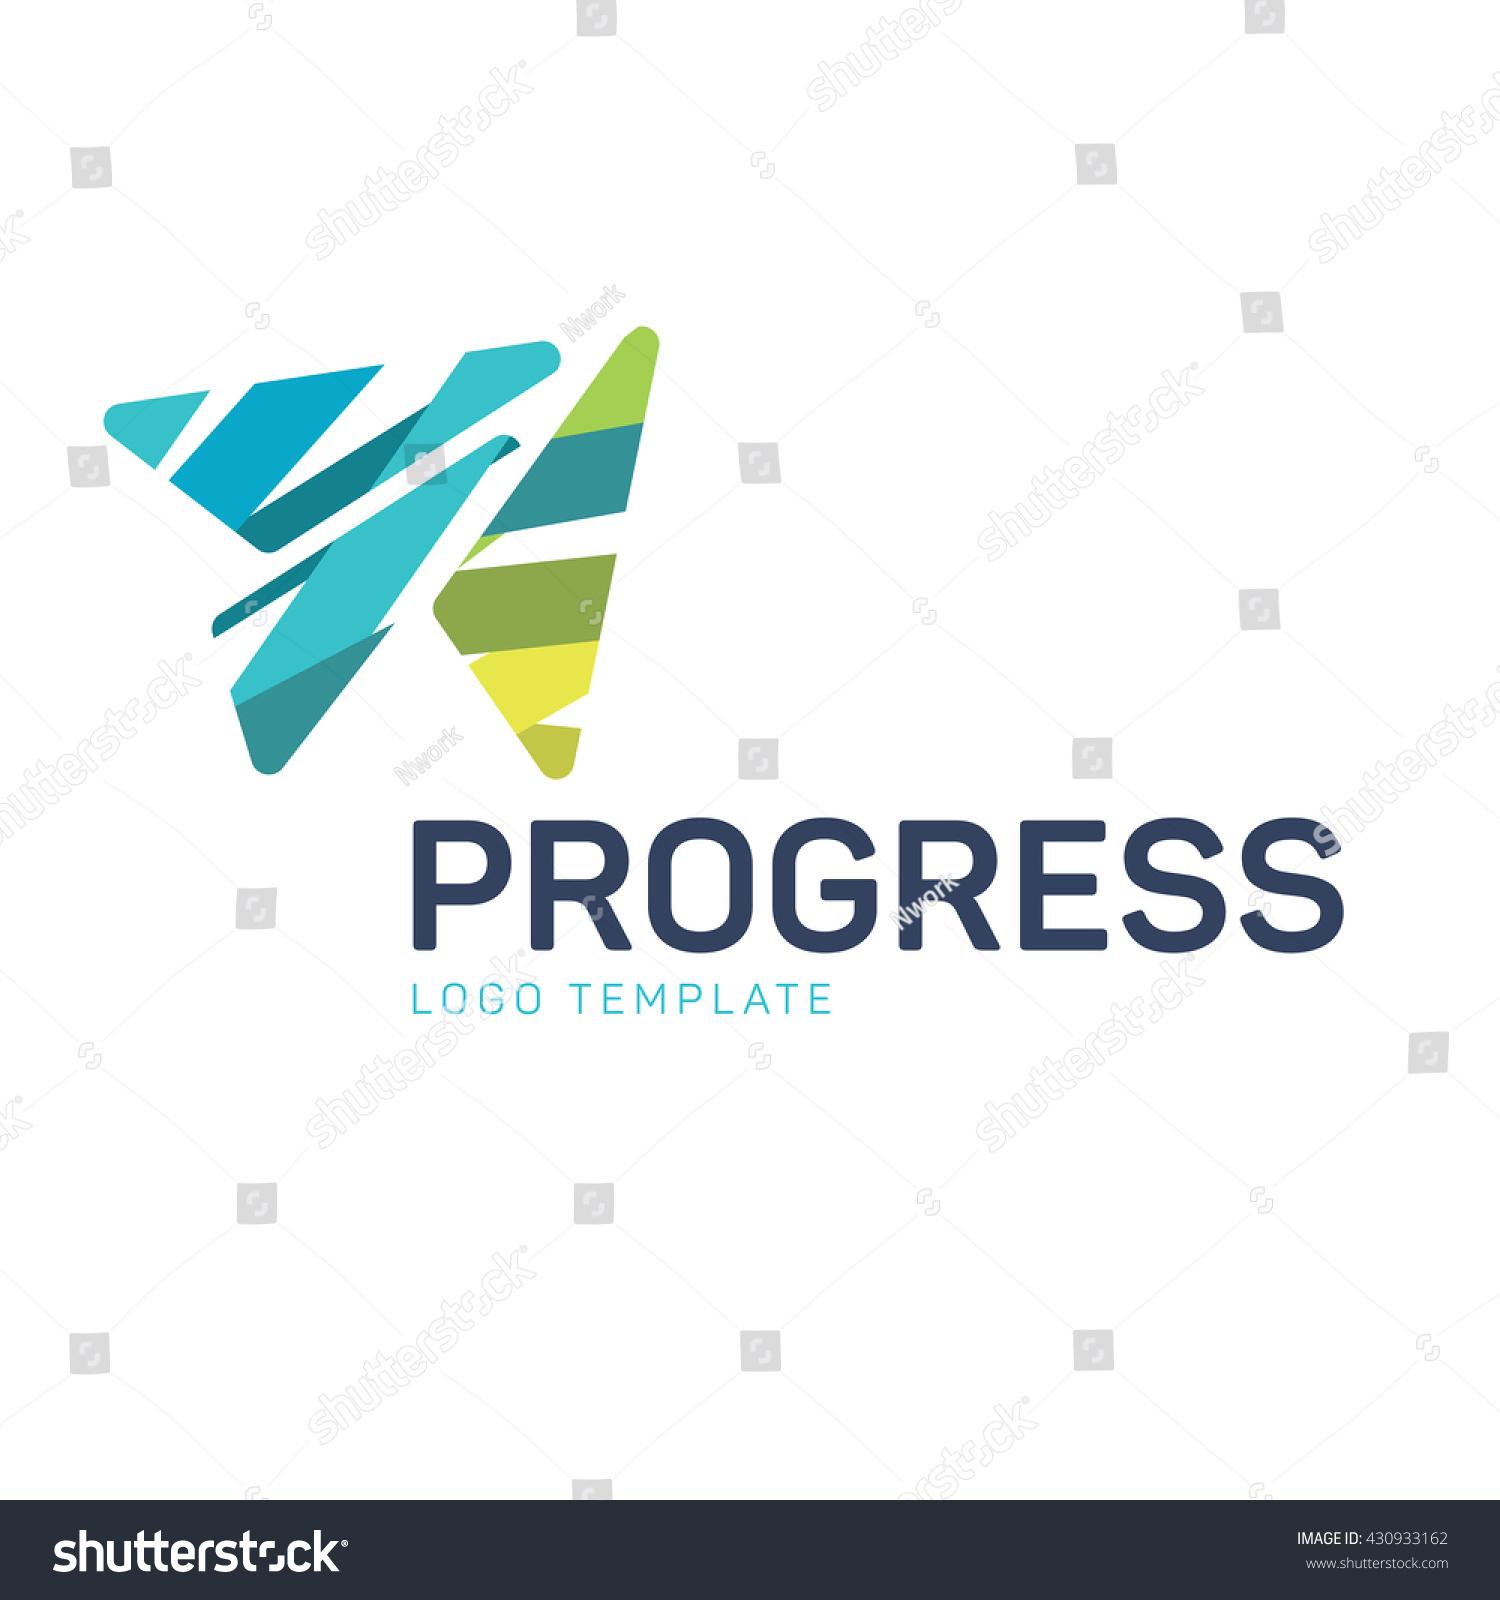 Progress Logo Template Stock Vector (Royalty Free) 430933162